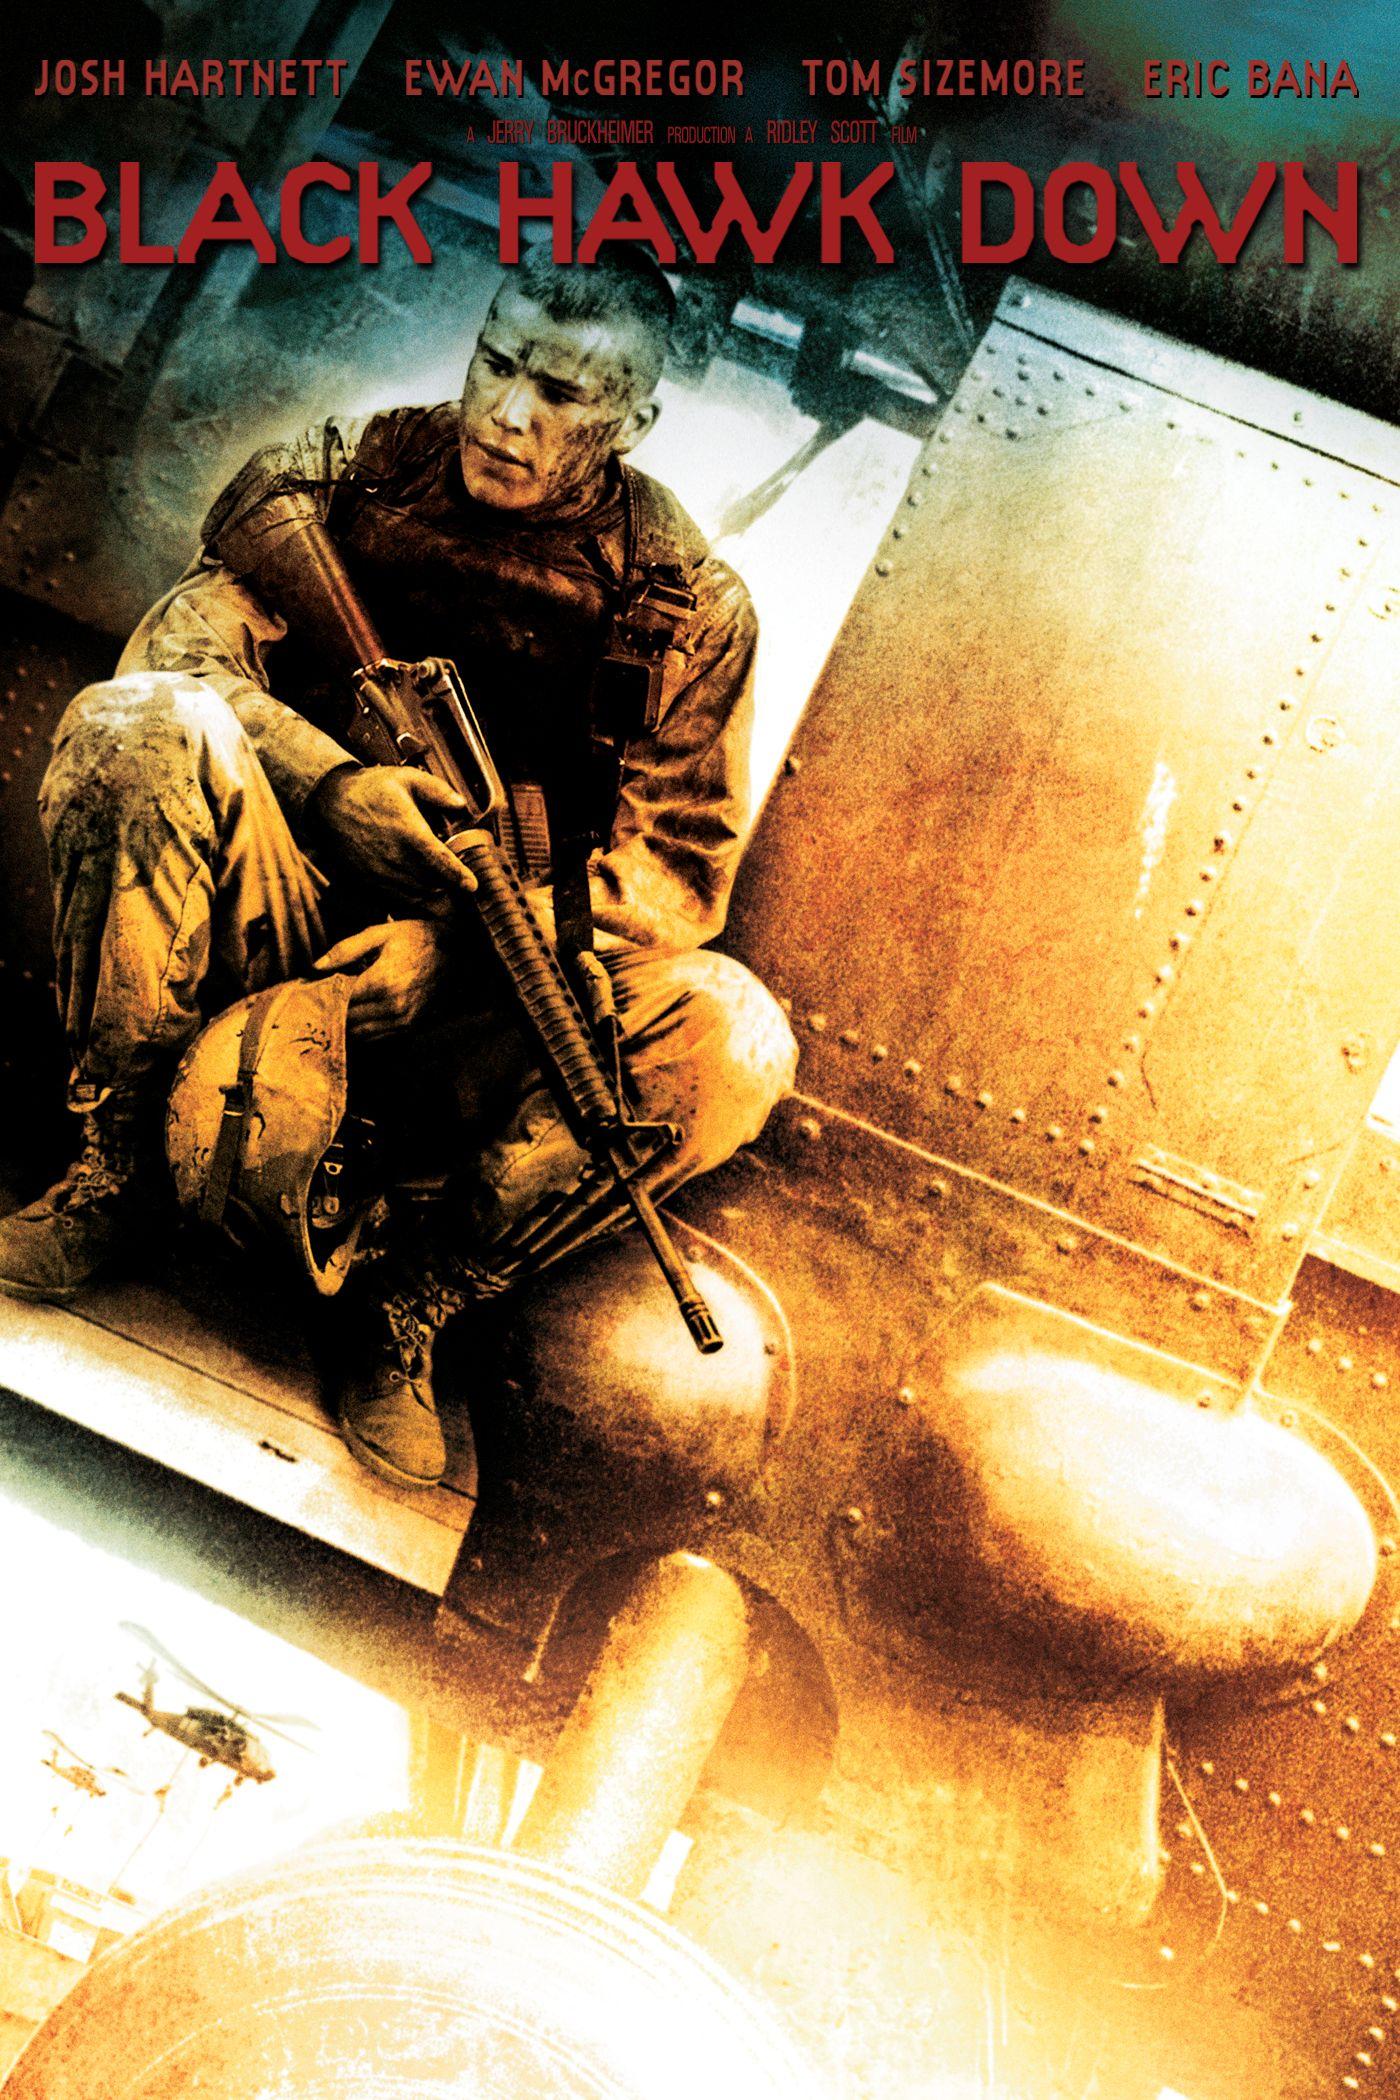 black hawk down 2001 full movie free download